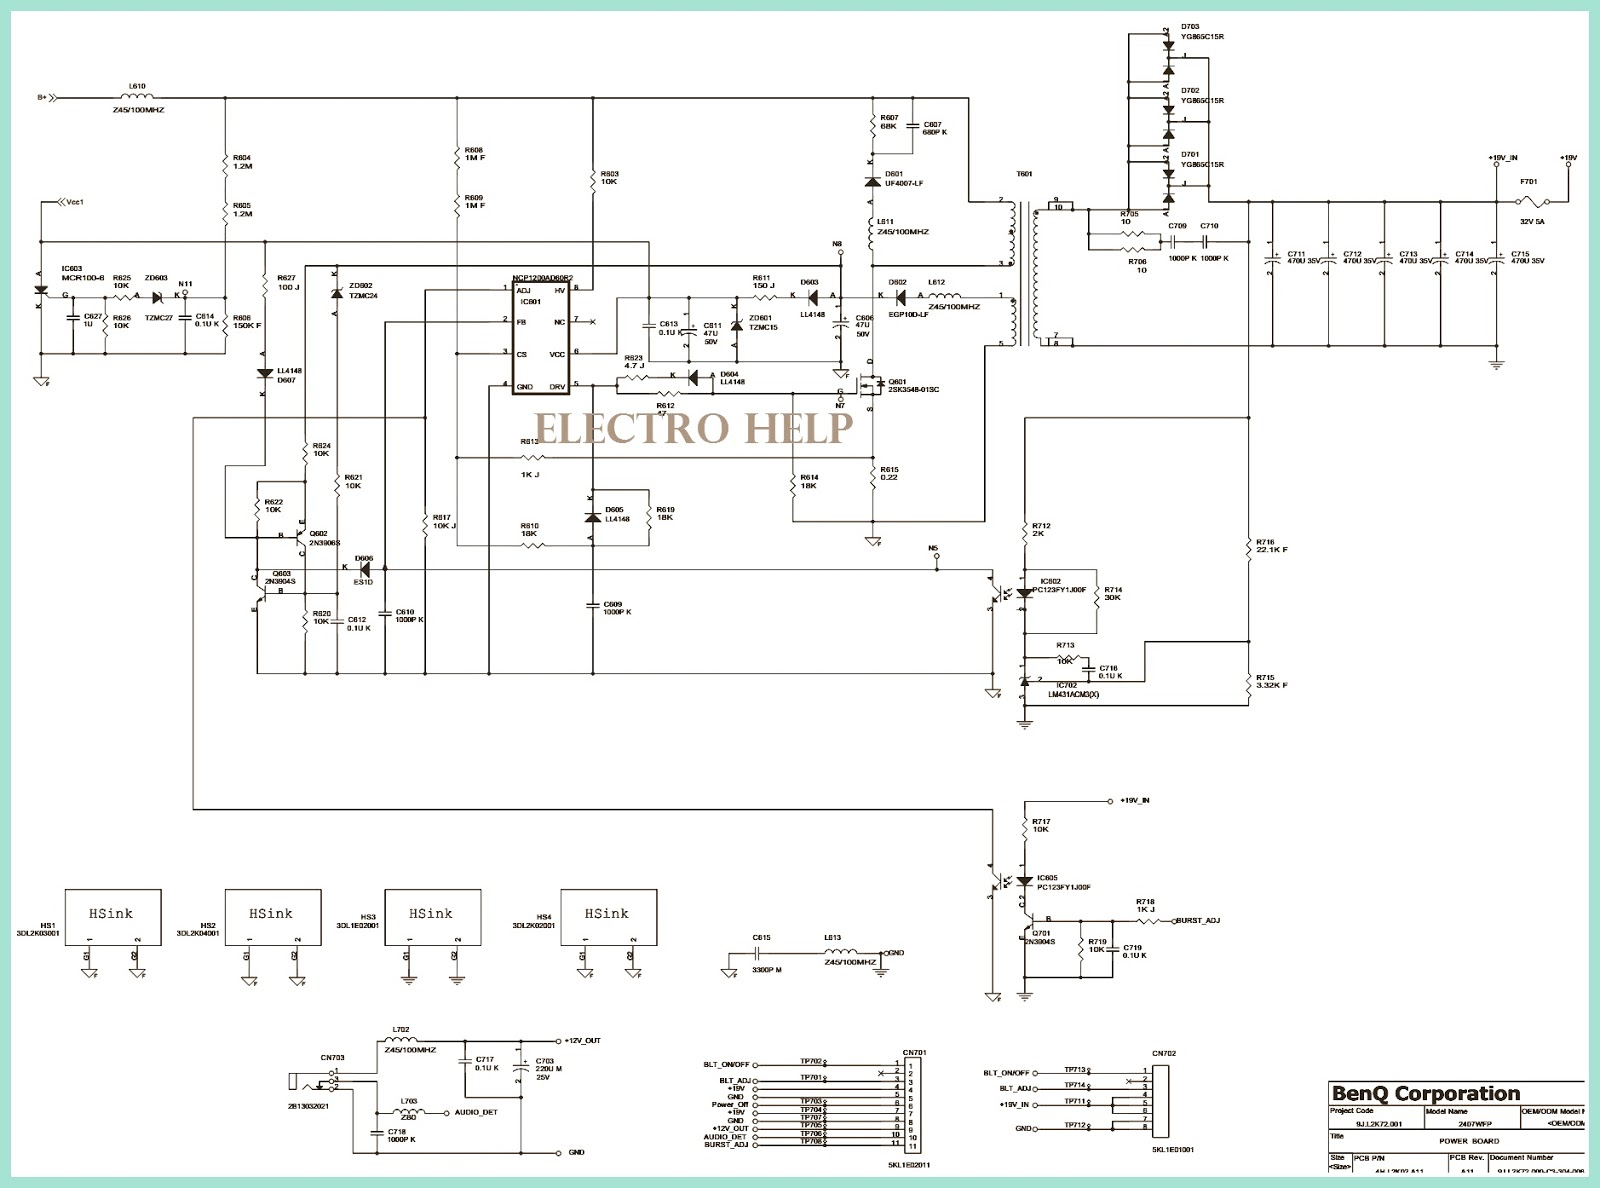 1000w dell power supply wiring diagram data wiring diagrams u2022 rh naopak co micro monitor wiring diagram monitor wiring diagram